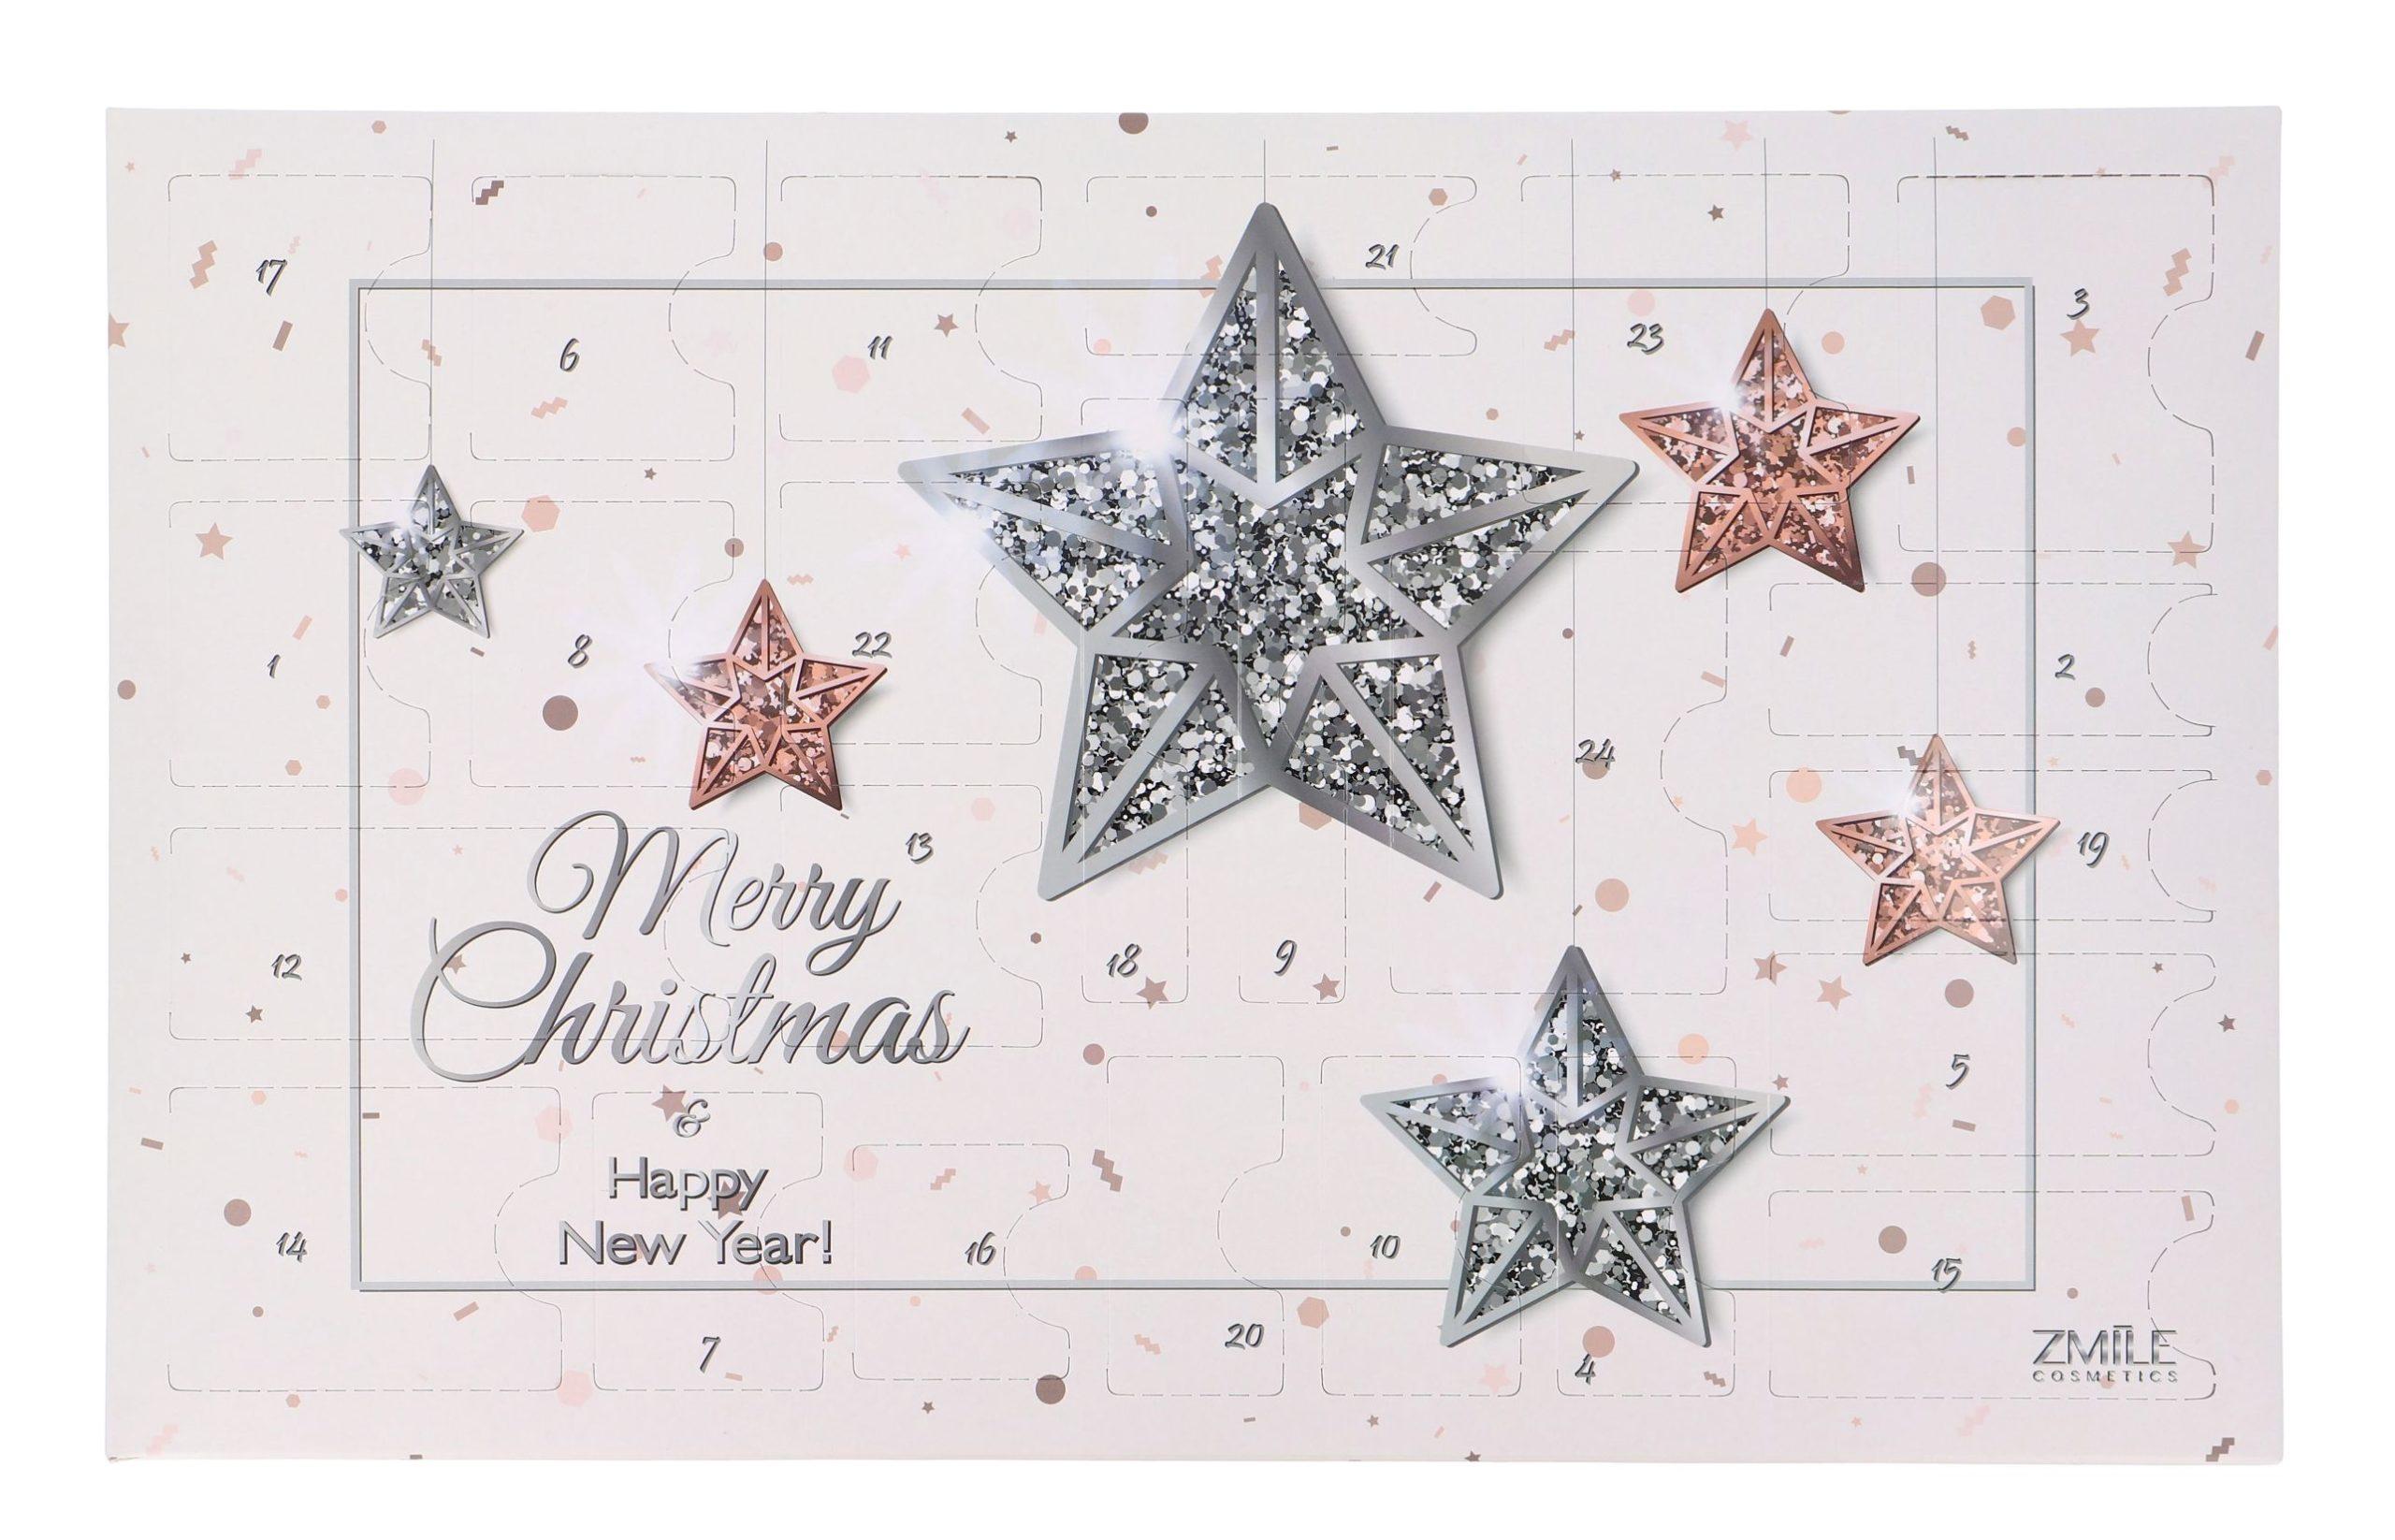 ZMILE COSMETICS - Advent calendar Glowing Stars rose gold/silver  makeup julekalender 2021